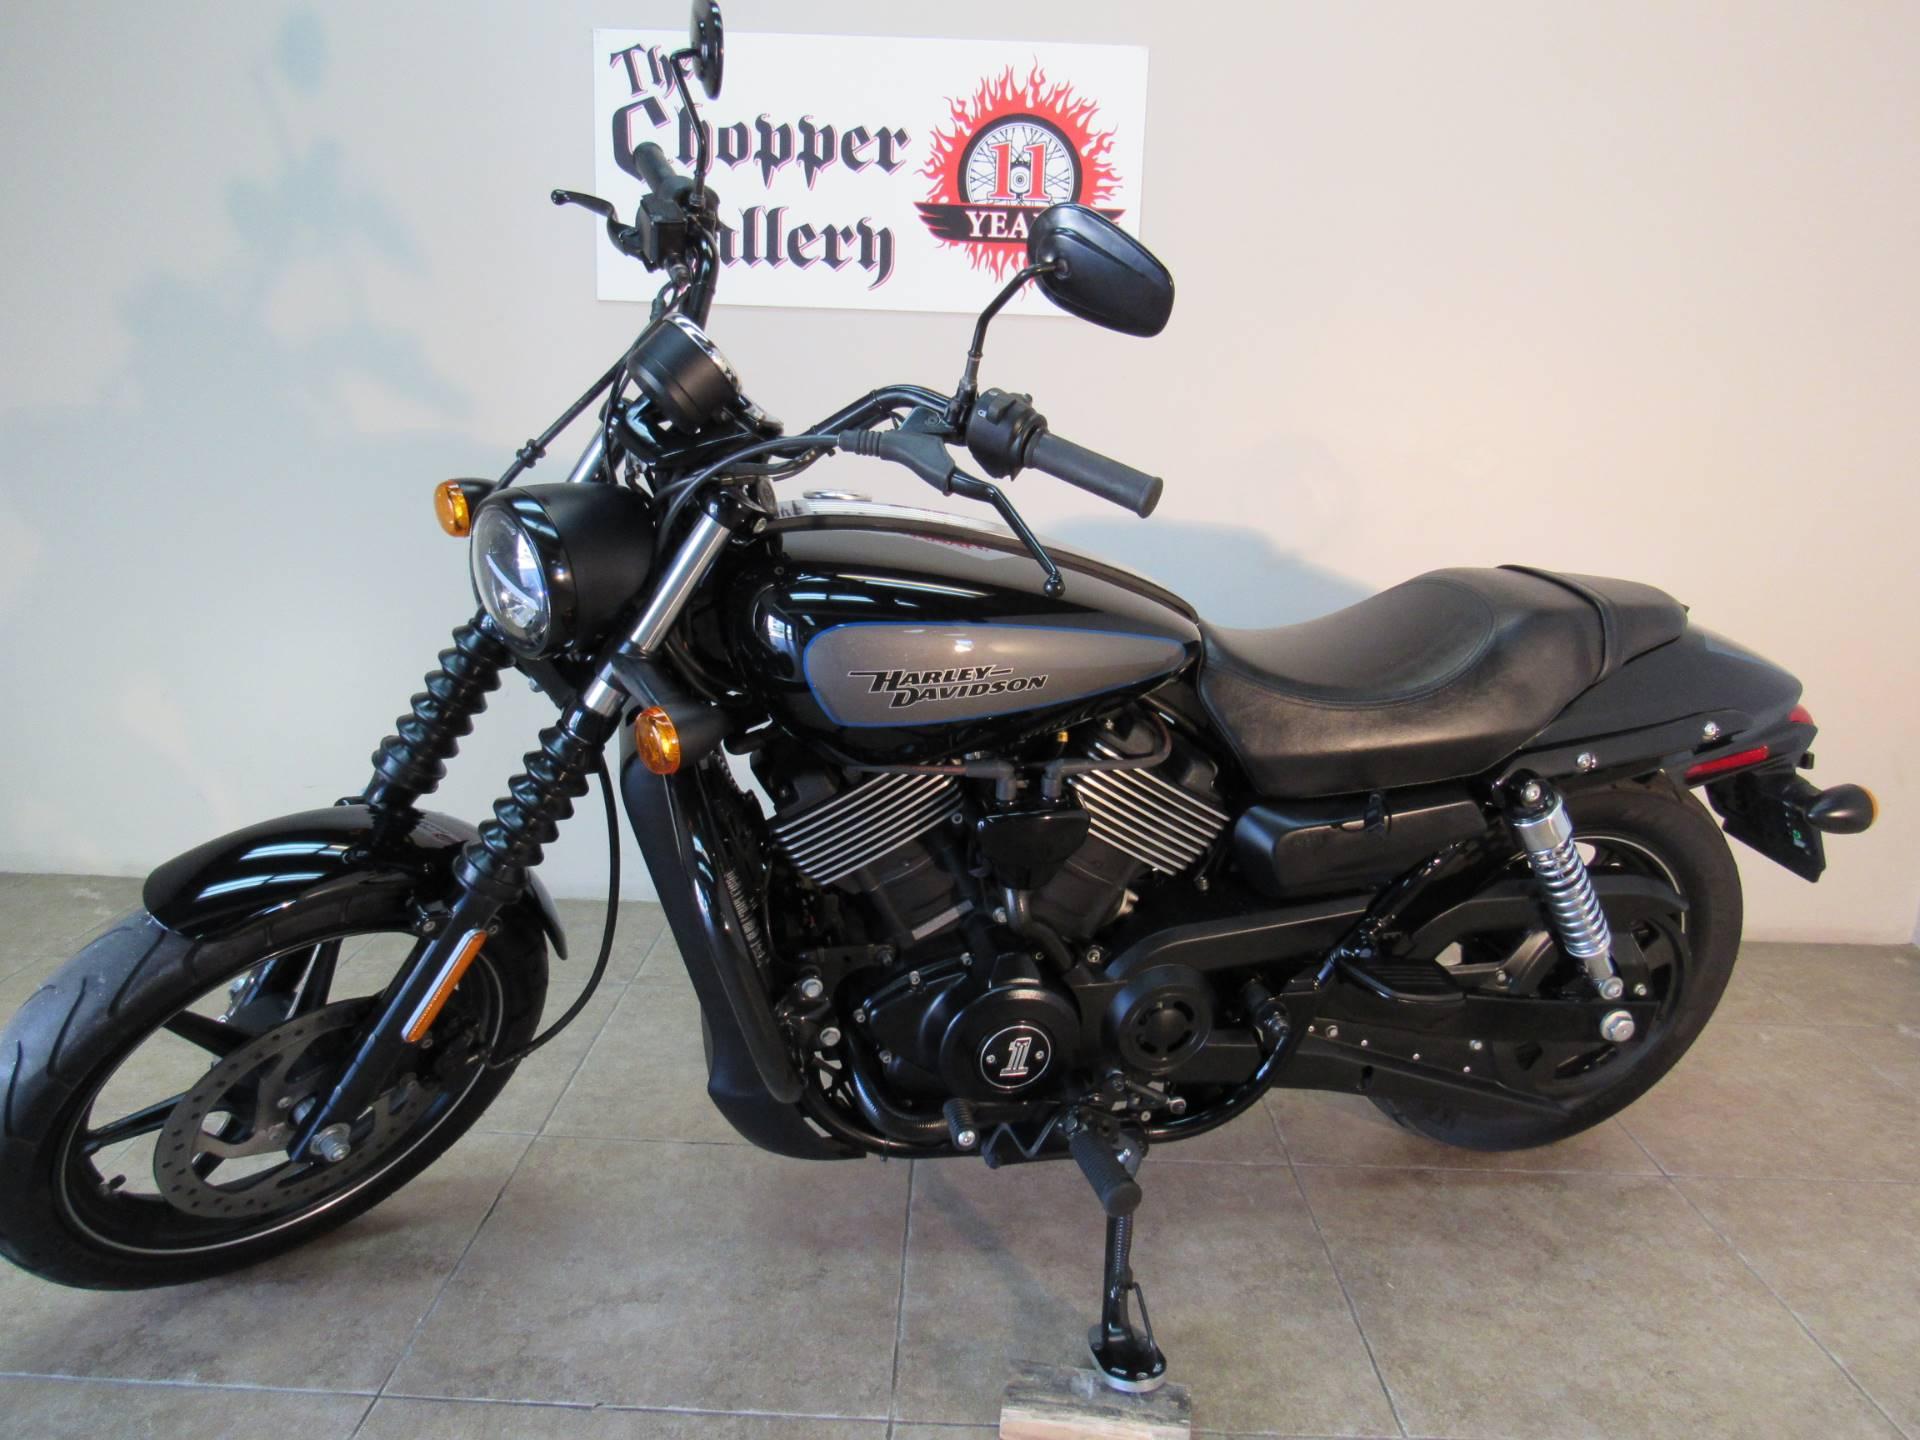 2017 Harley Davidson Street 750 In Temecula California